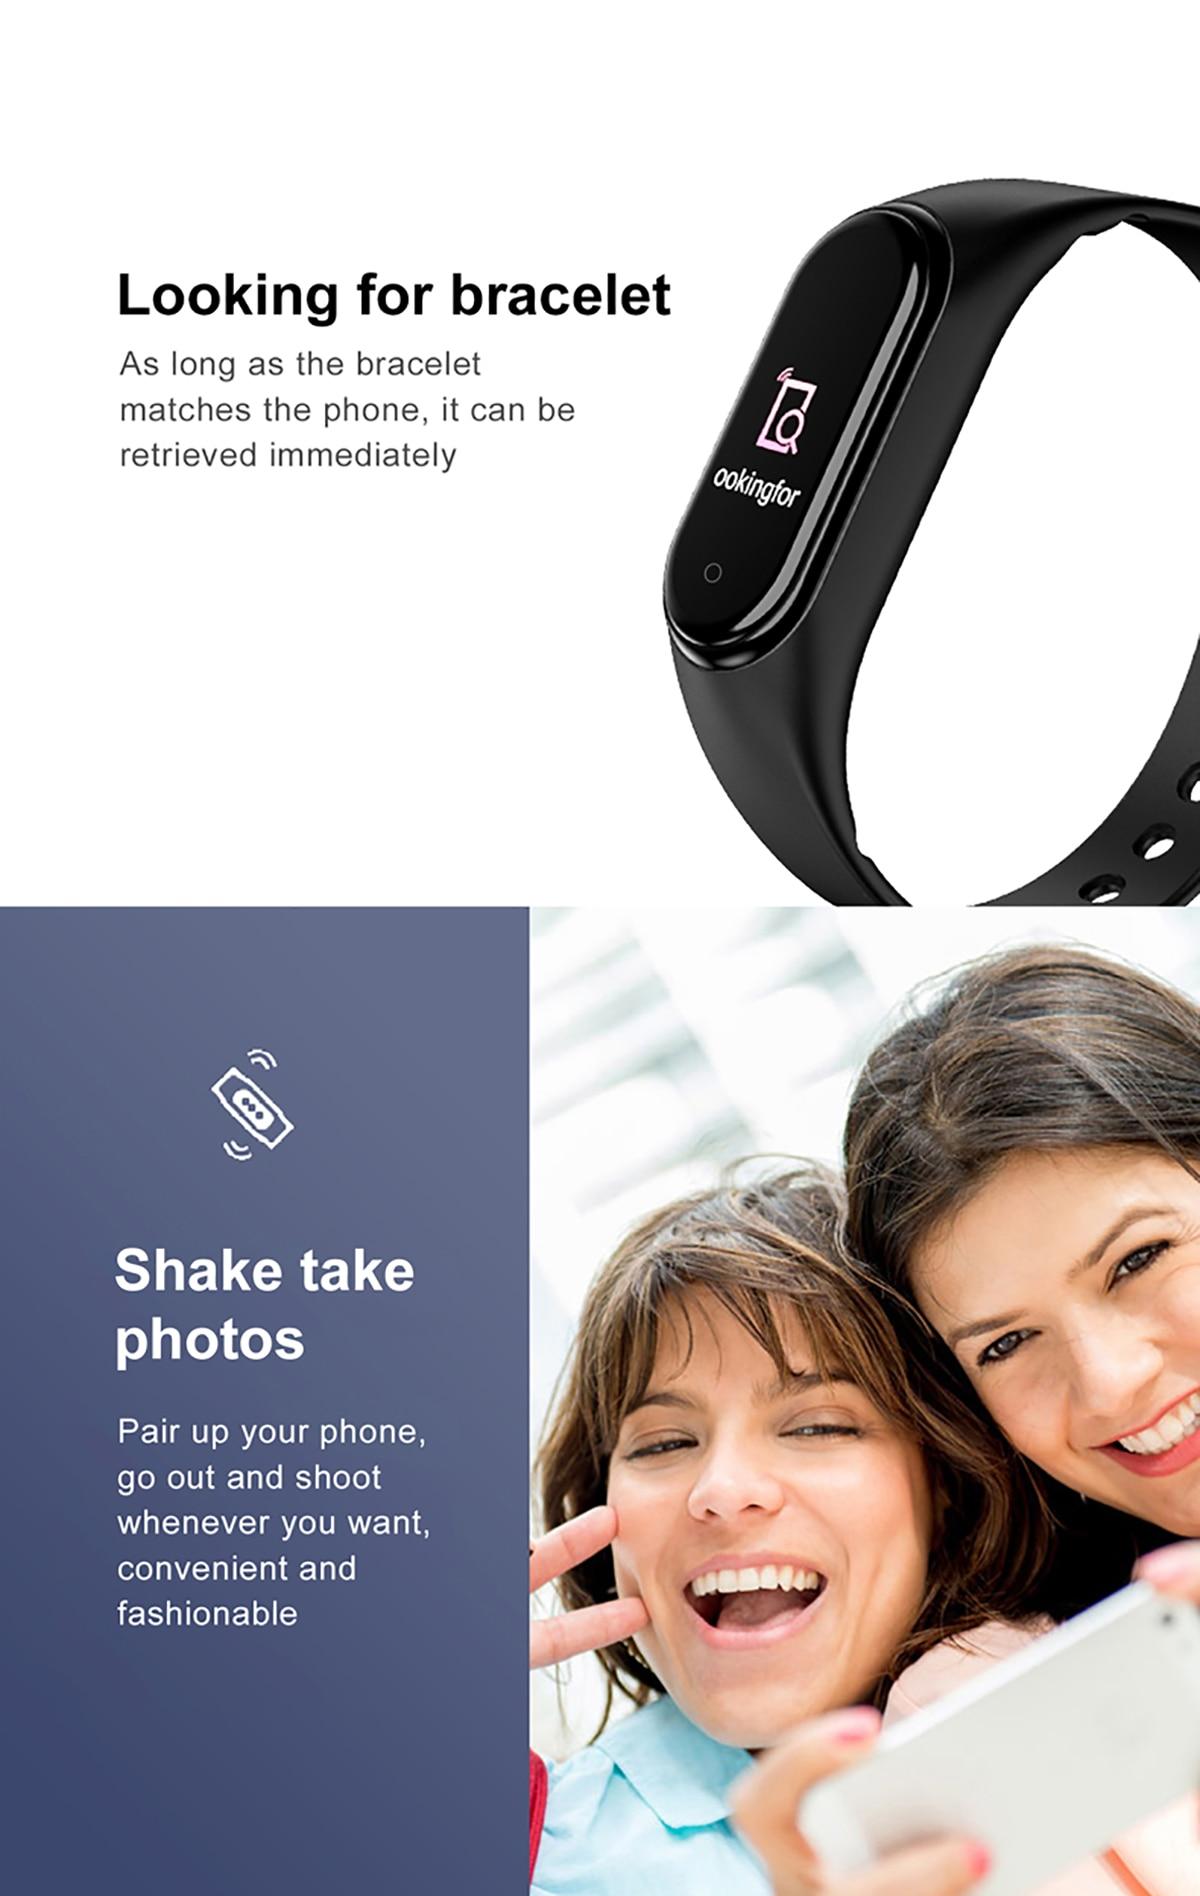 Hb3836407a94d46a684a386ad7605e675c New M4 Smart Band Fitness Tracker Smart Watch Sport Smart Bracelet Heart Rate Blood Pressure Smartband Monitor Health Wristband